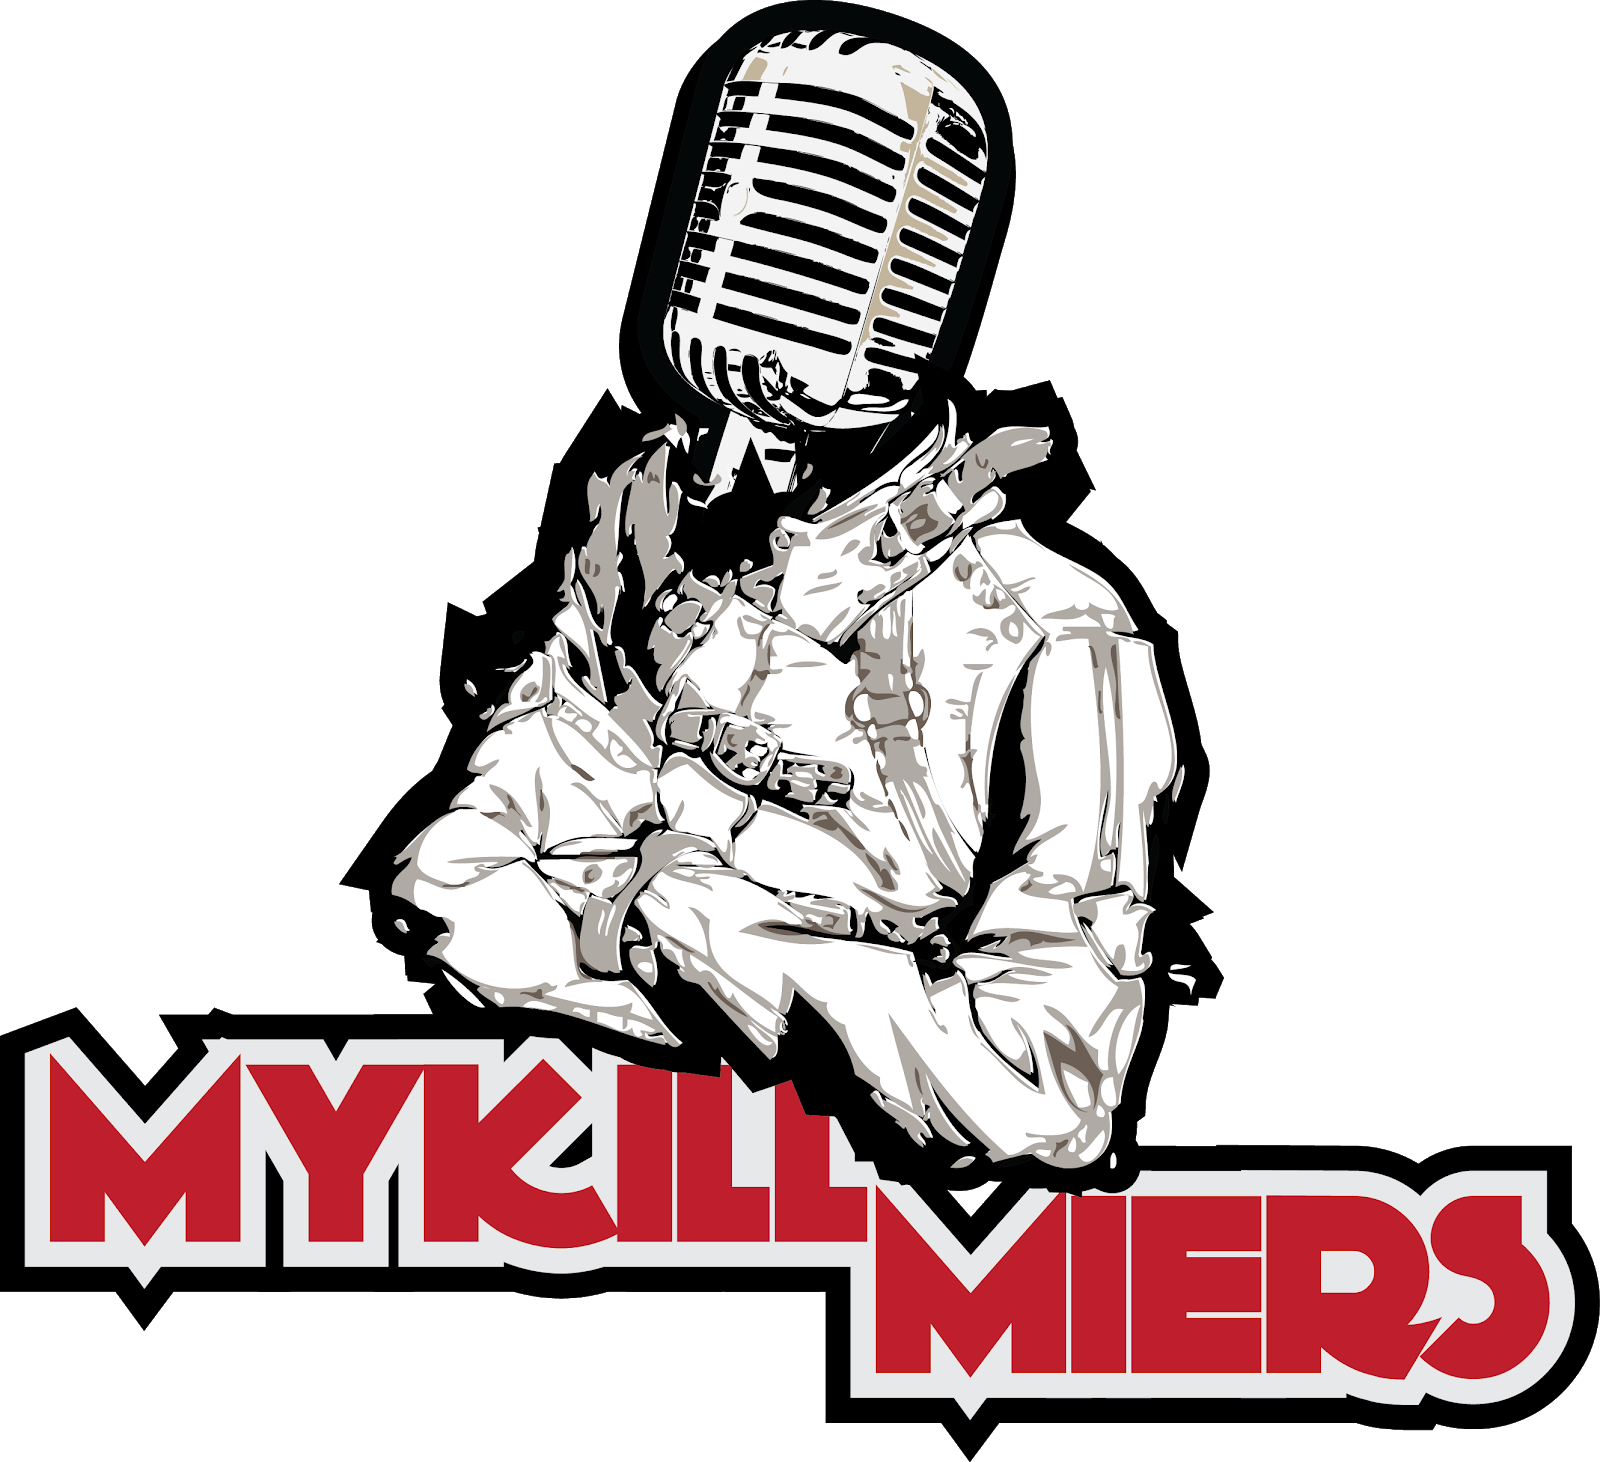 Mykill Miers News